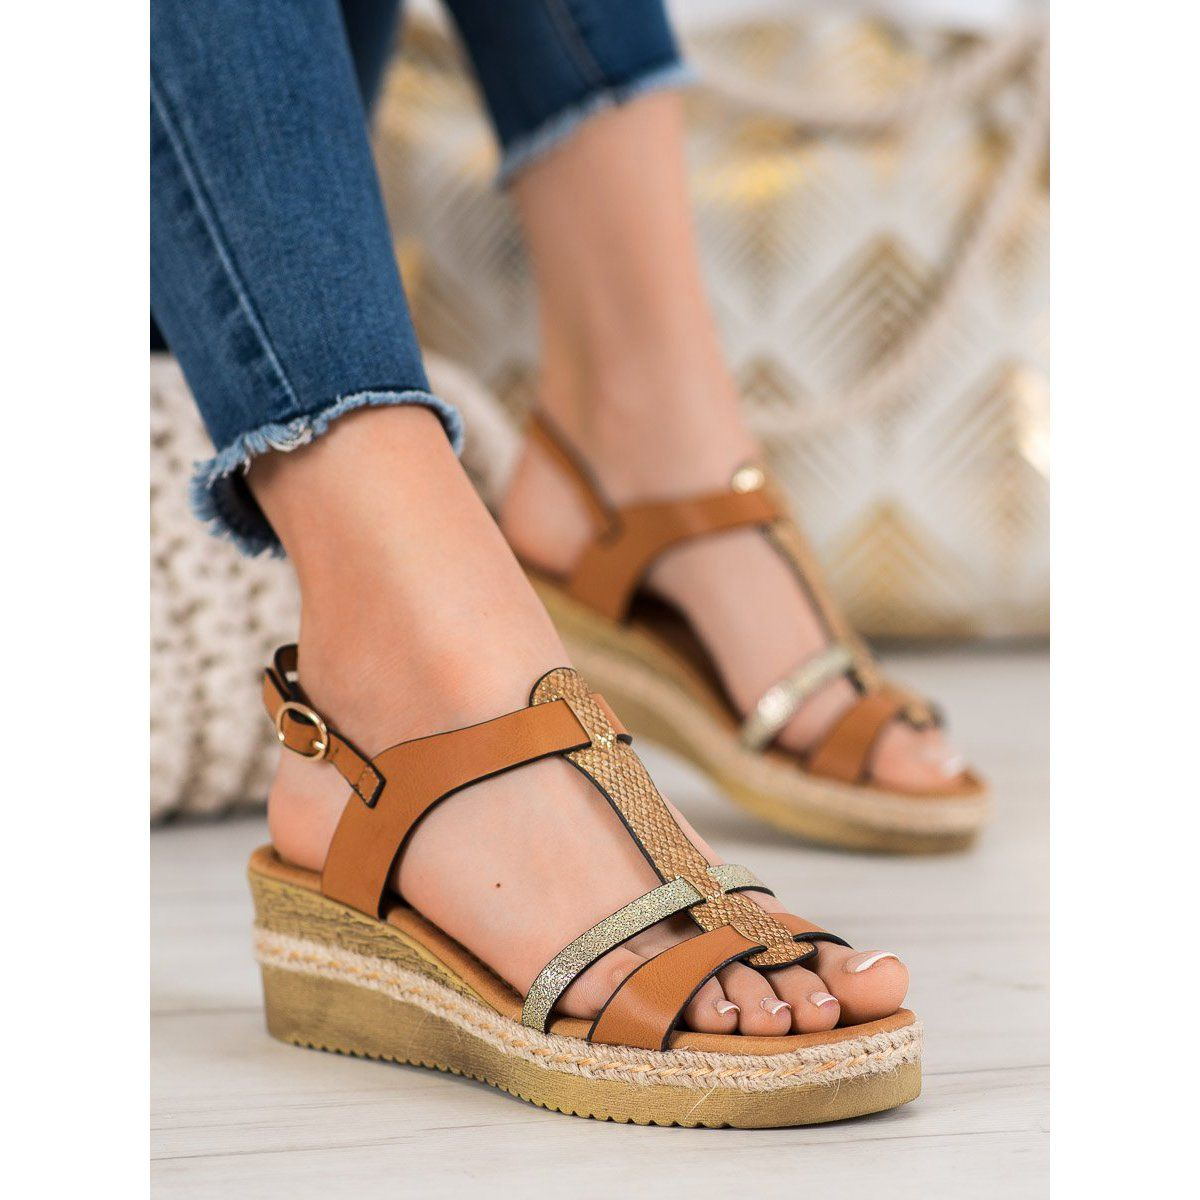 Small Swan Sandalki Na Koturnie Brazowe Zolte Sandals Beige Wedge Sandals Black Wedge Sandals